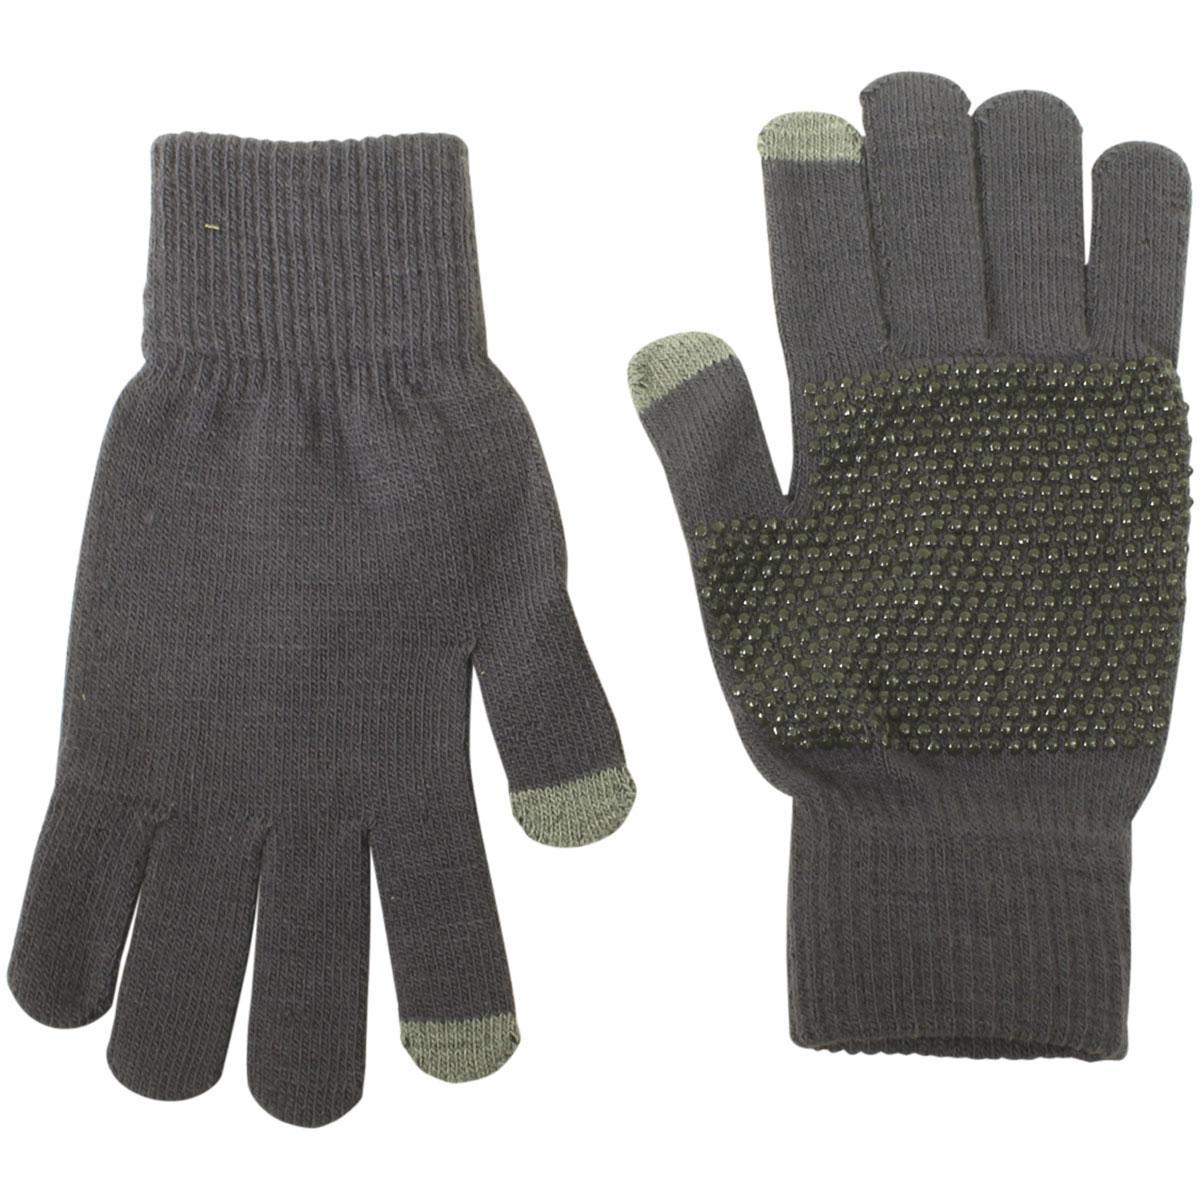 Dorfman Pacific Men's Touchscreen Magic Knit Gloves